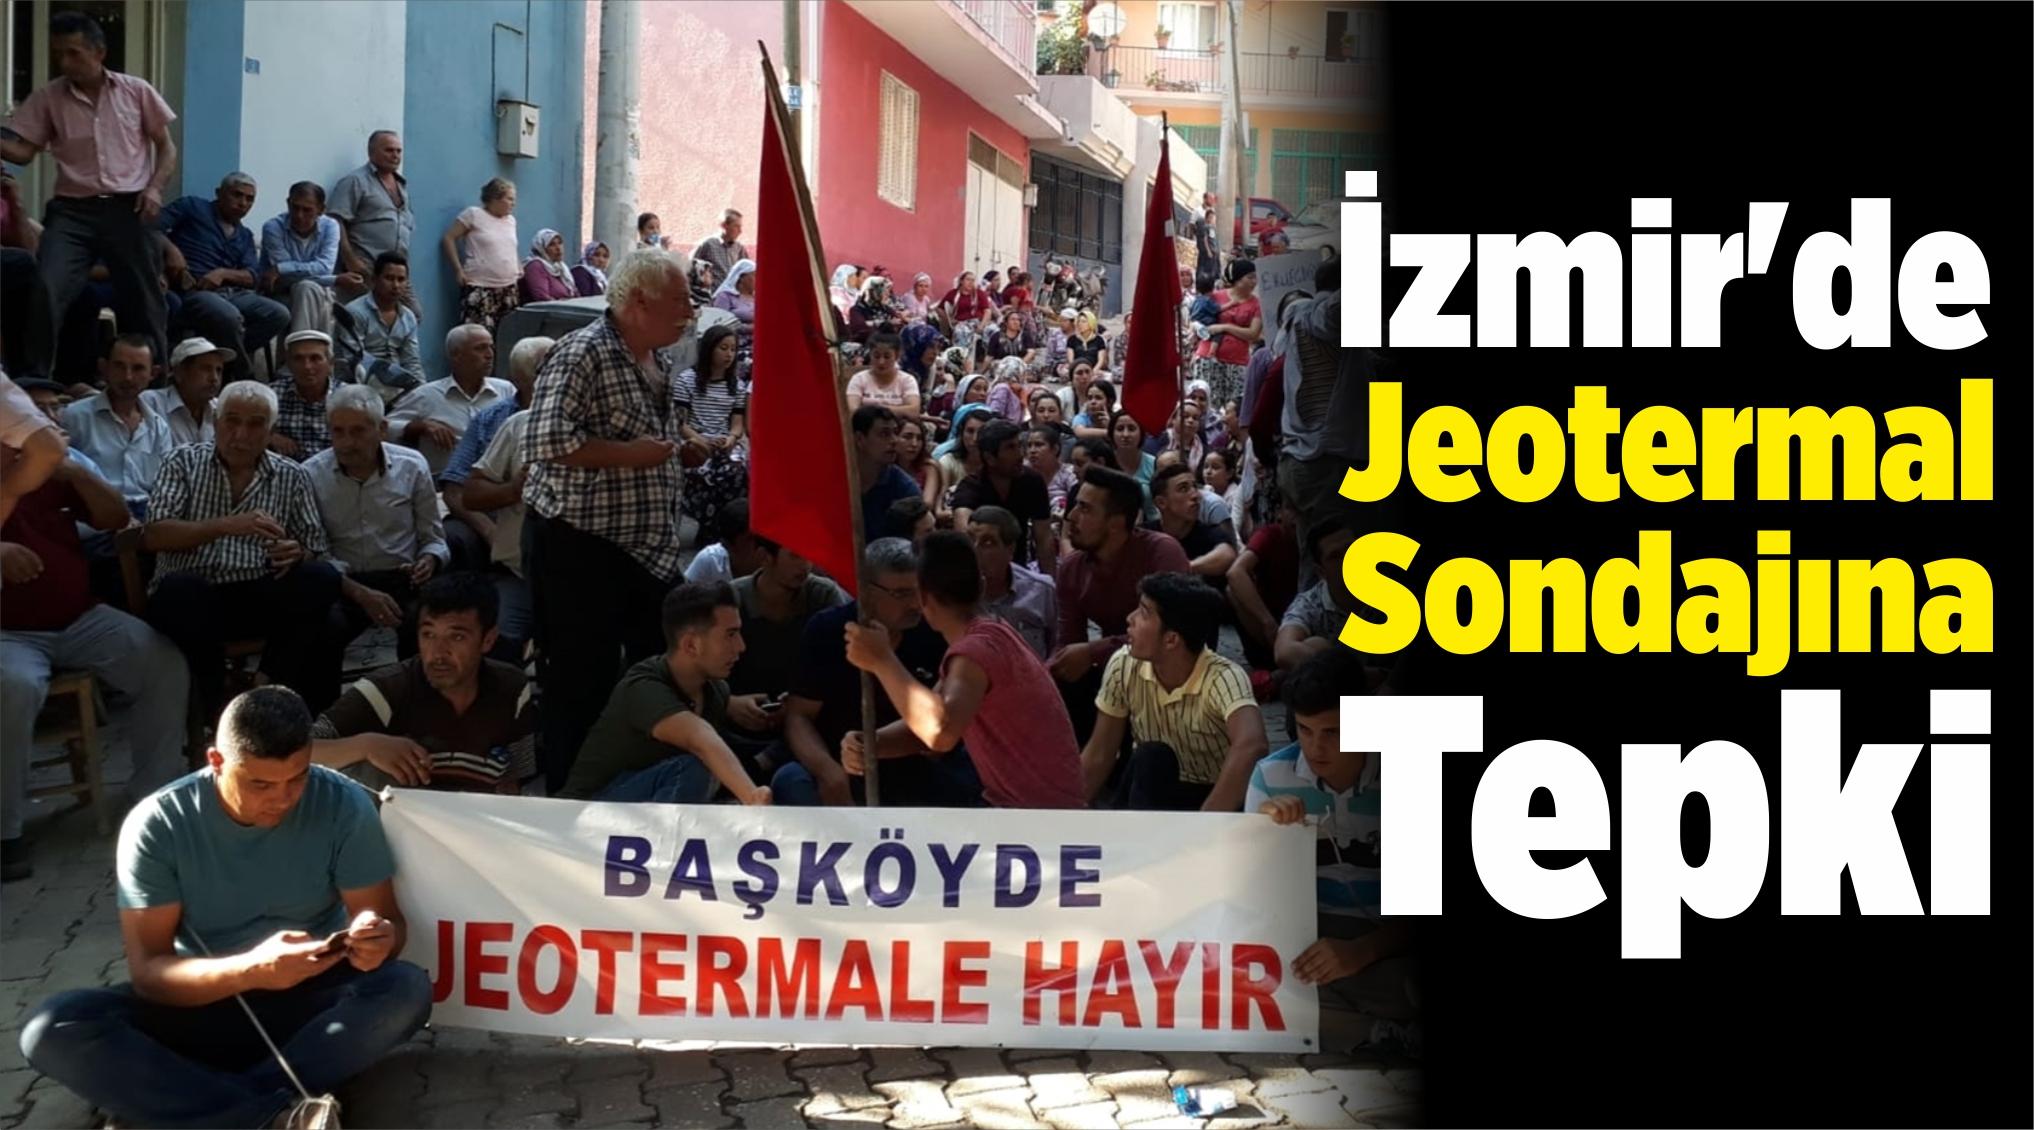 İzmir'de Jeotermal Sondajına Tepki